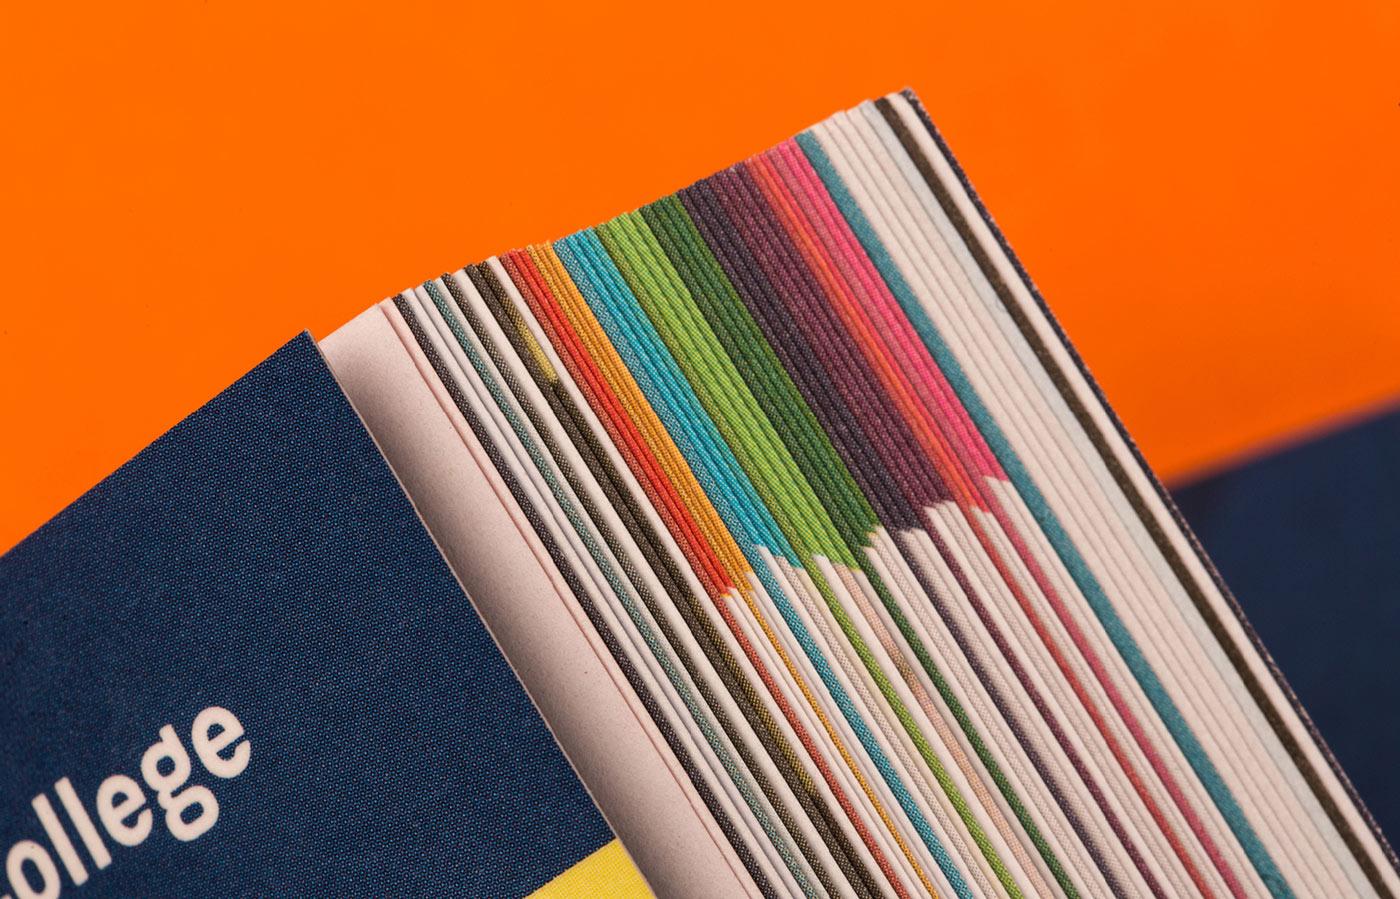 MIC brand guidelines development for print designs